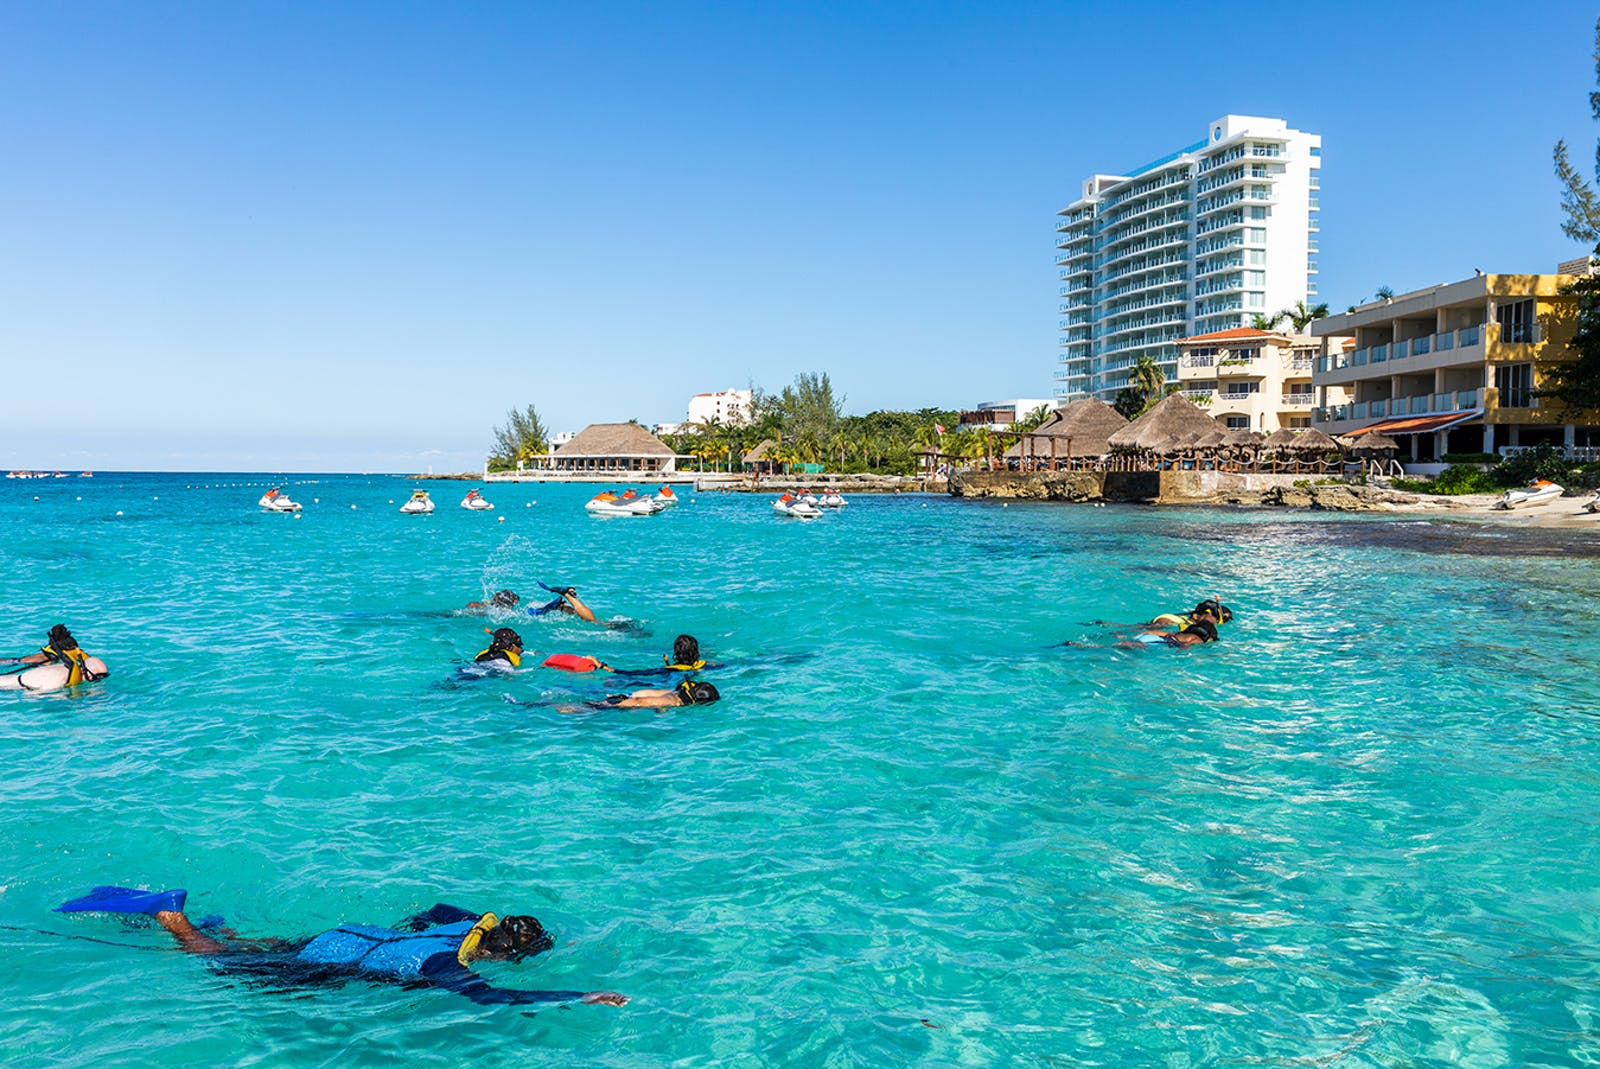 Carnival cruise snorkeling in Cozumel